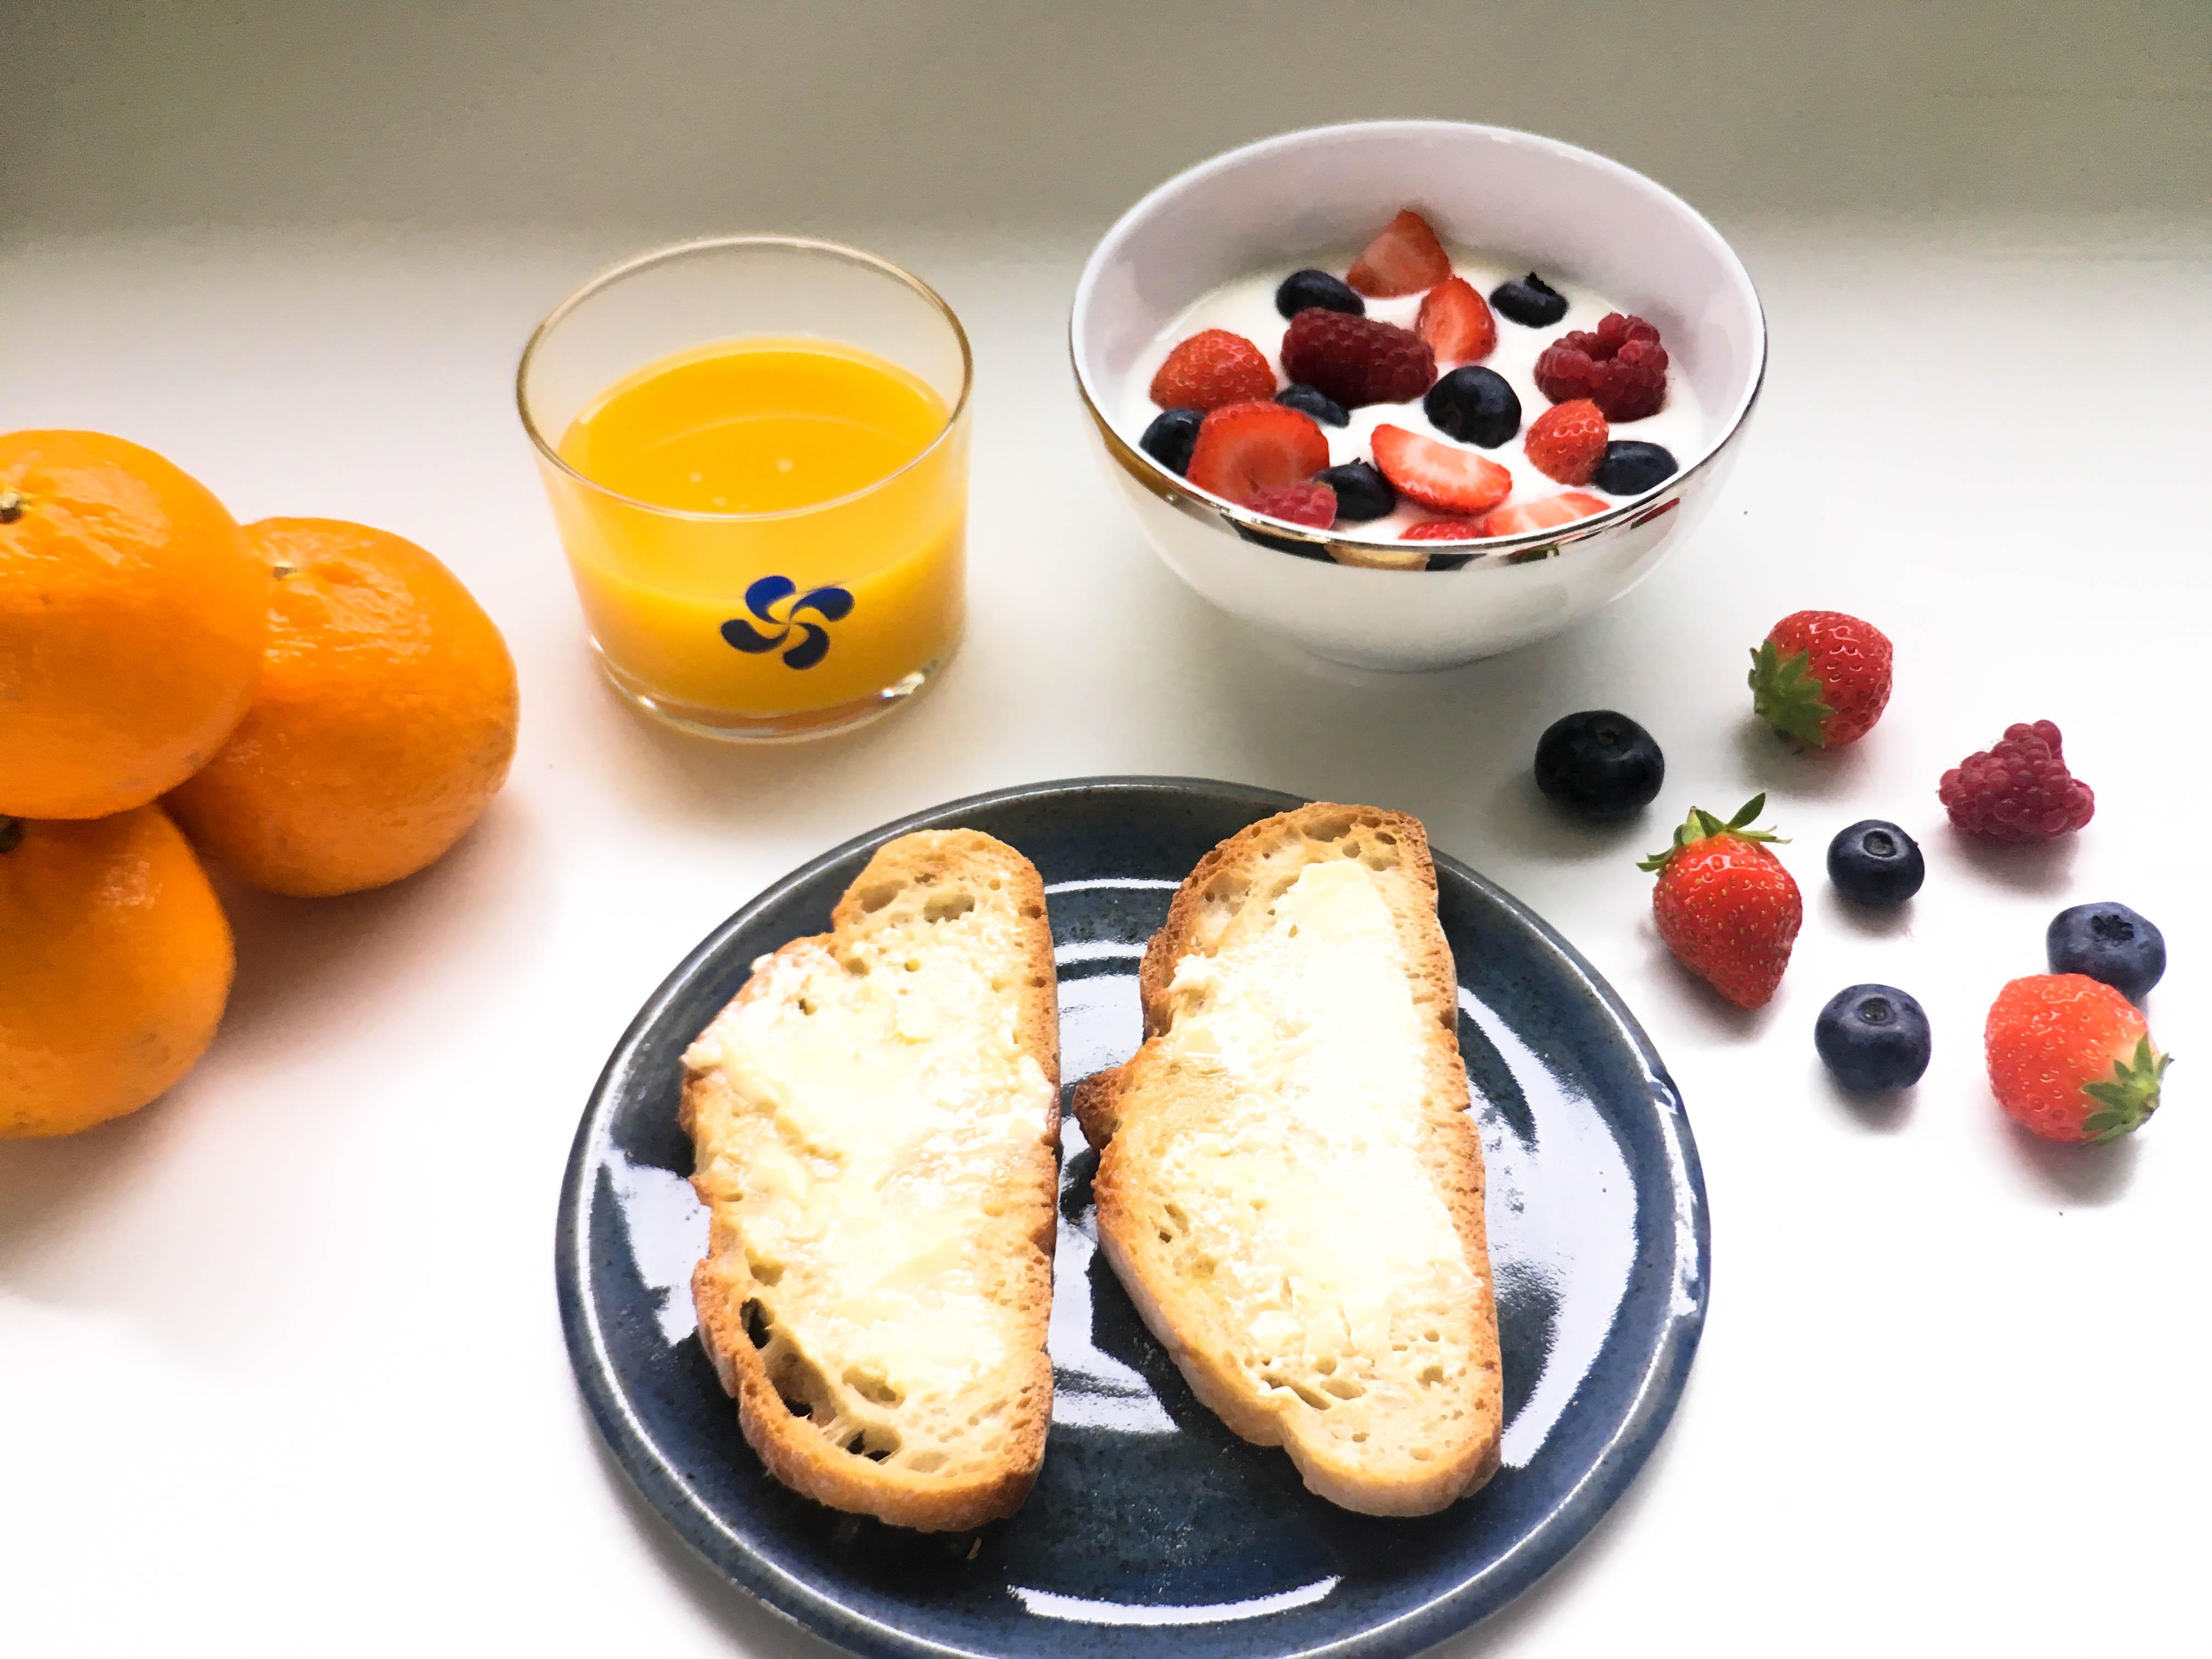 Petit déjeuner gourmand et fruité